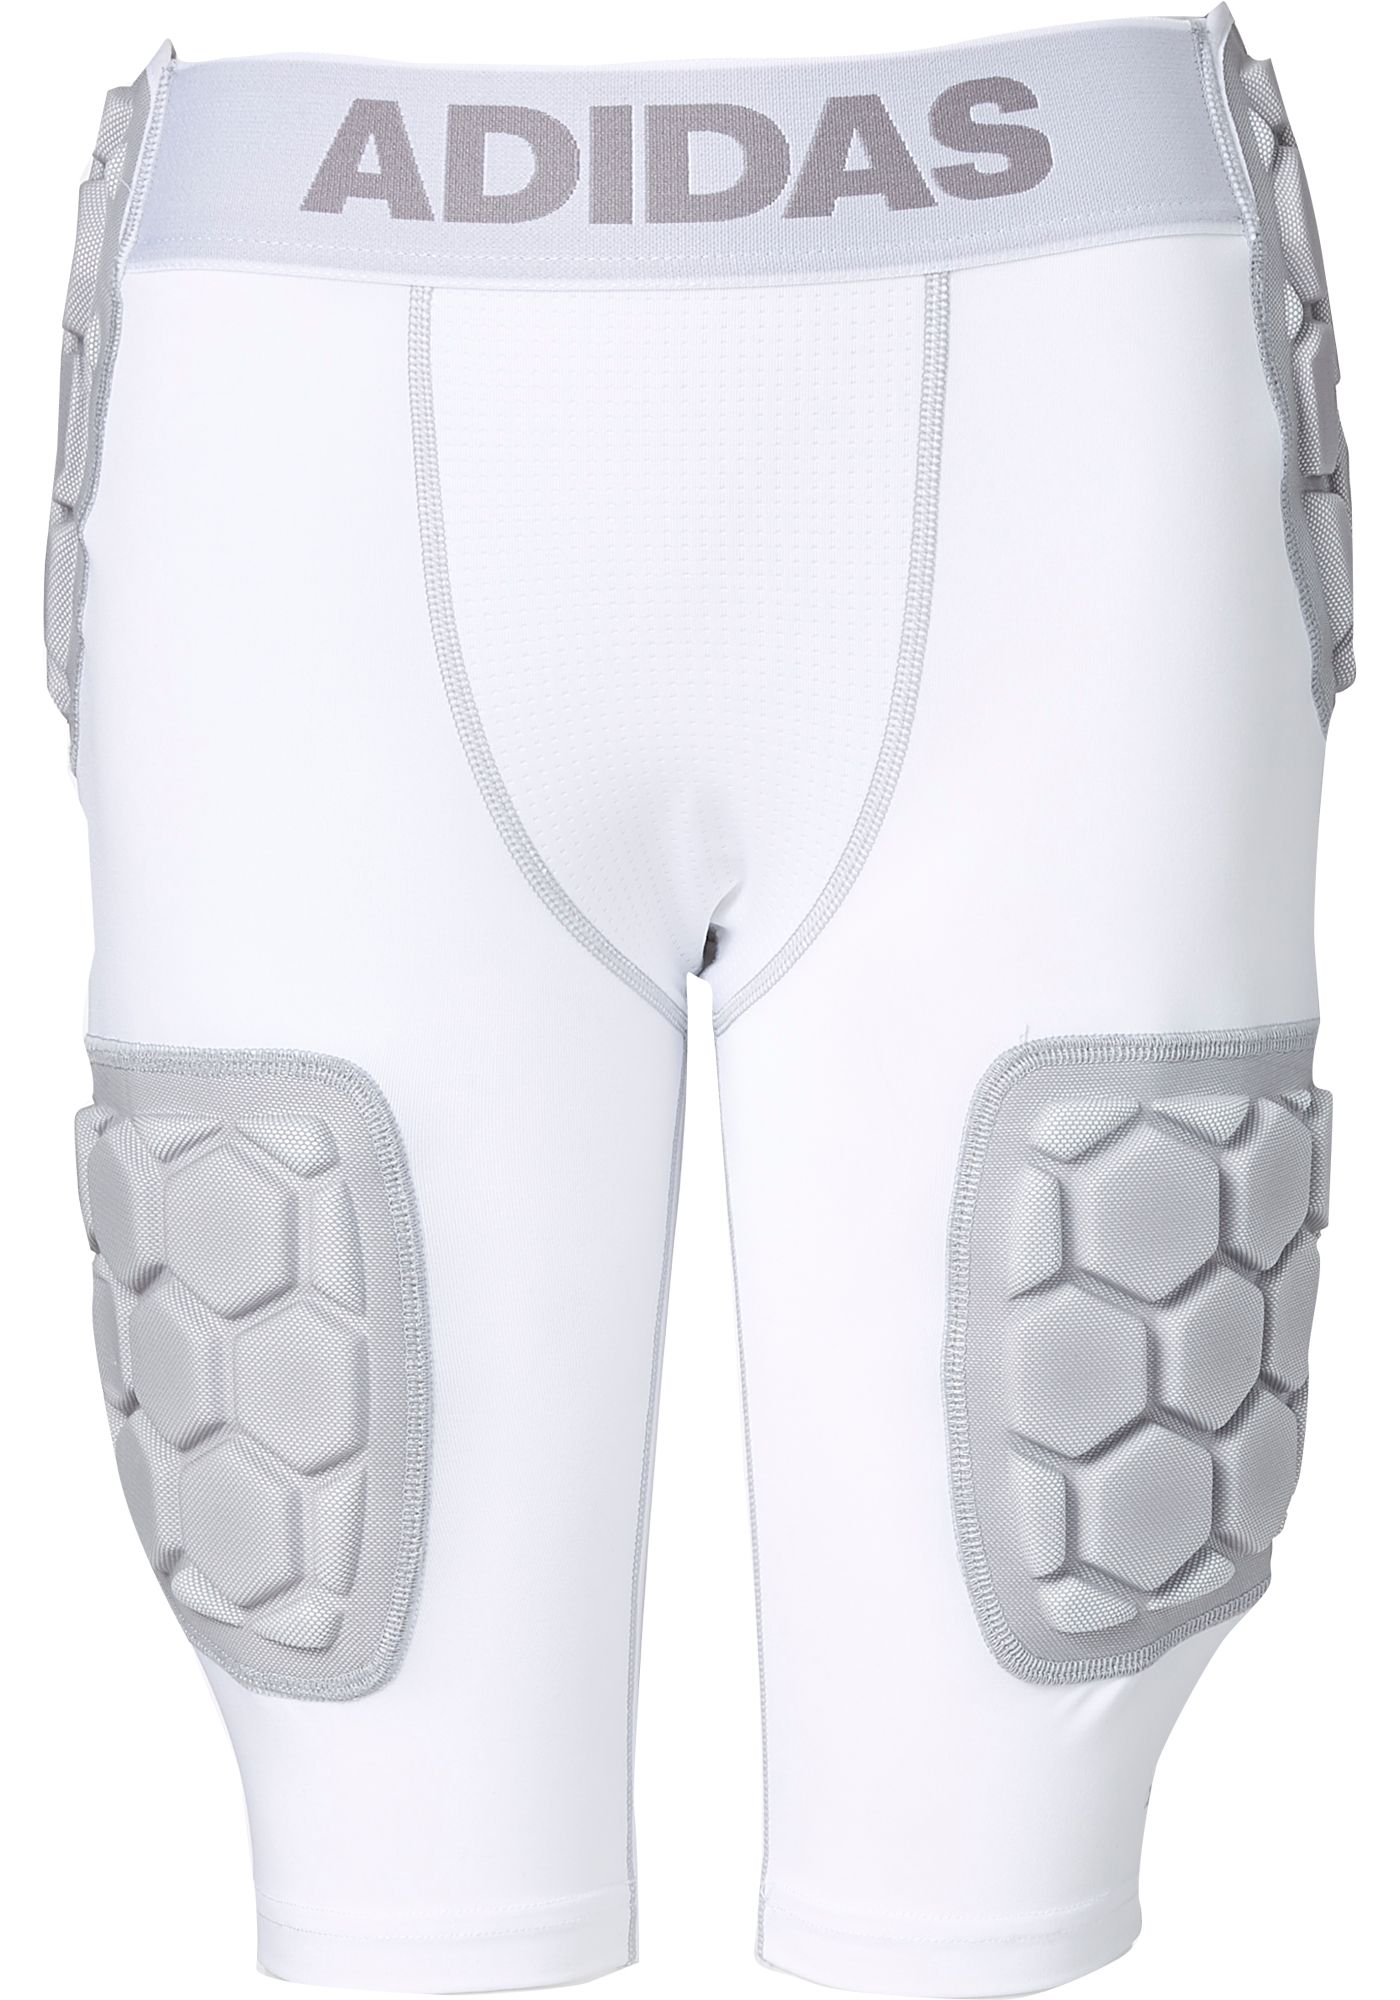 adidas Youth techfit 5-Pad Football Girdle